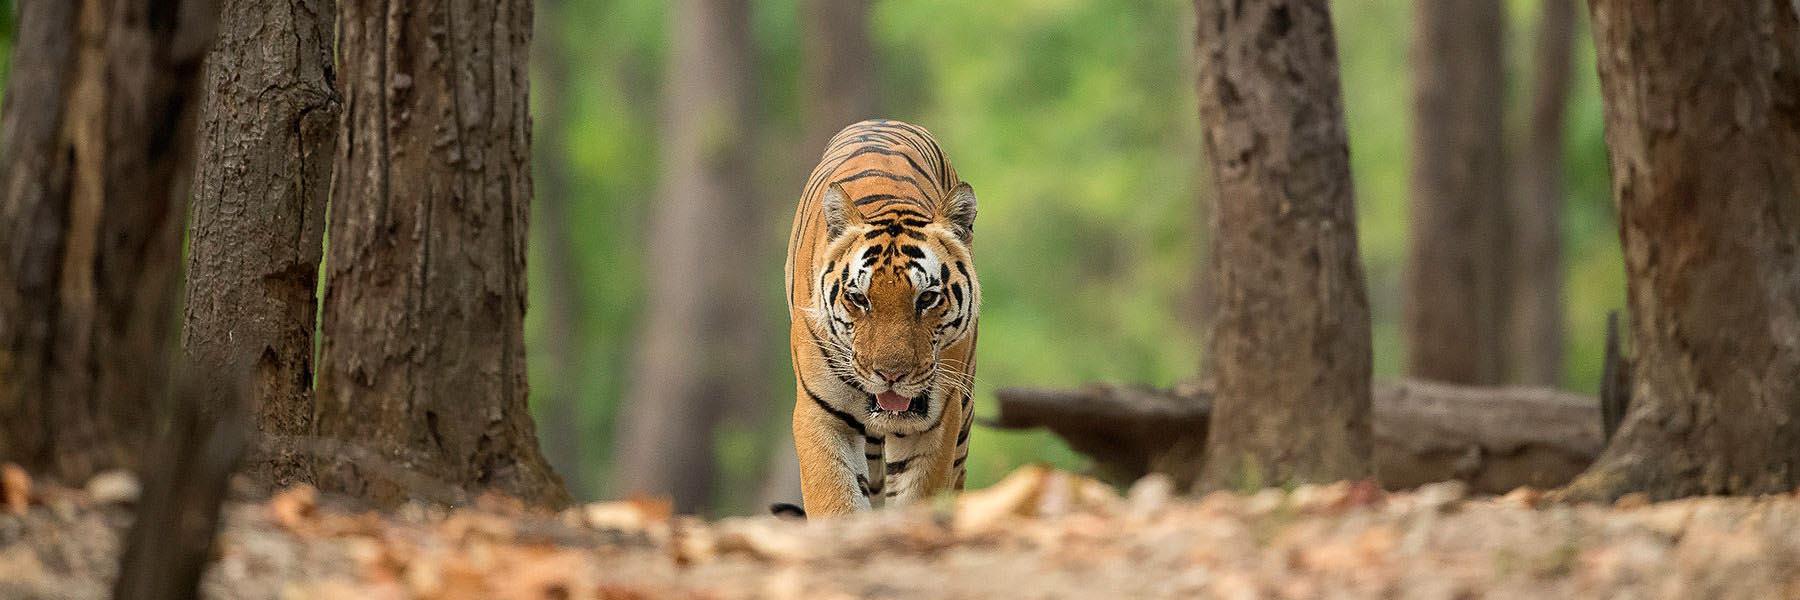 Tiger safaris in India